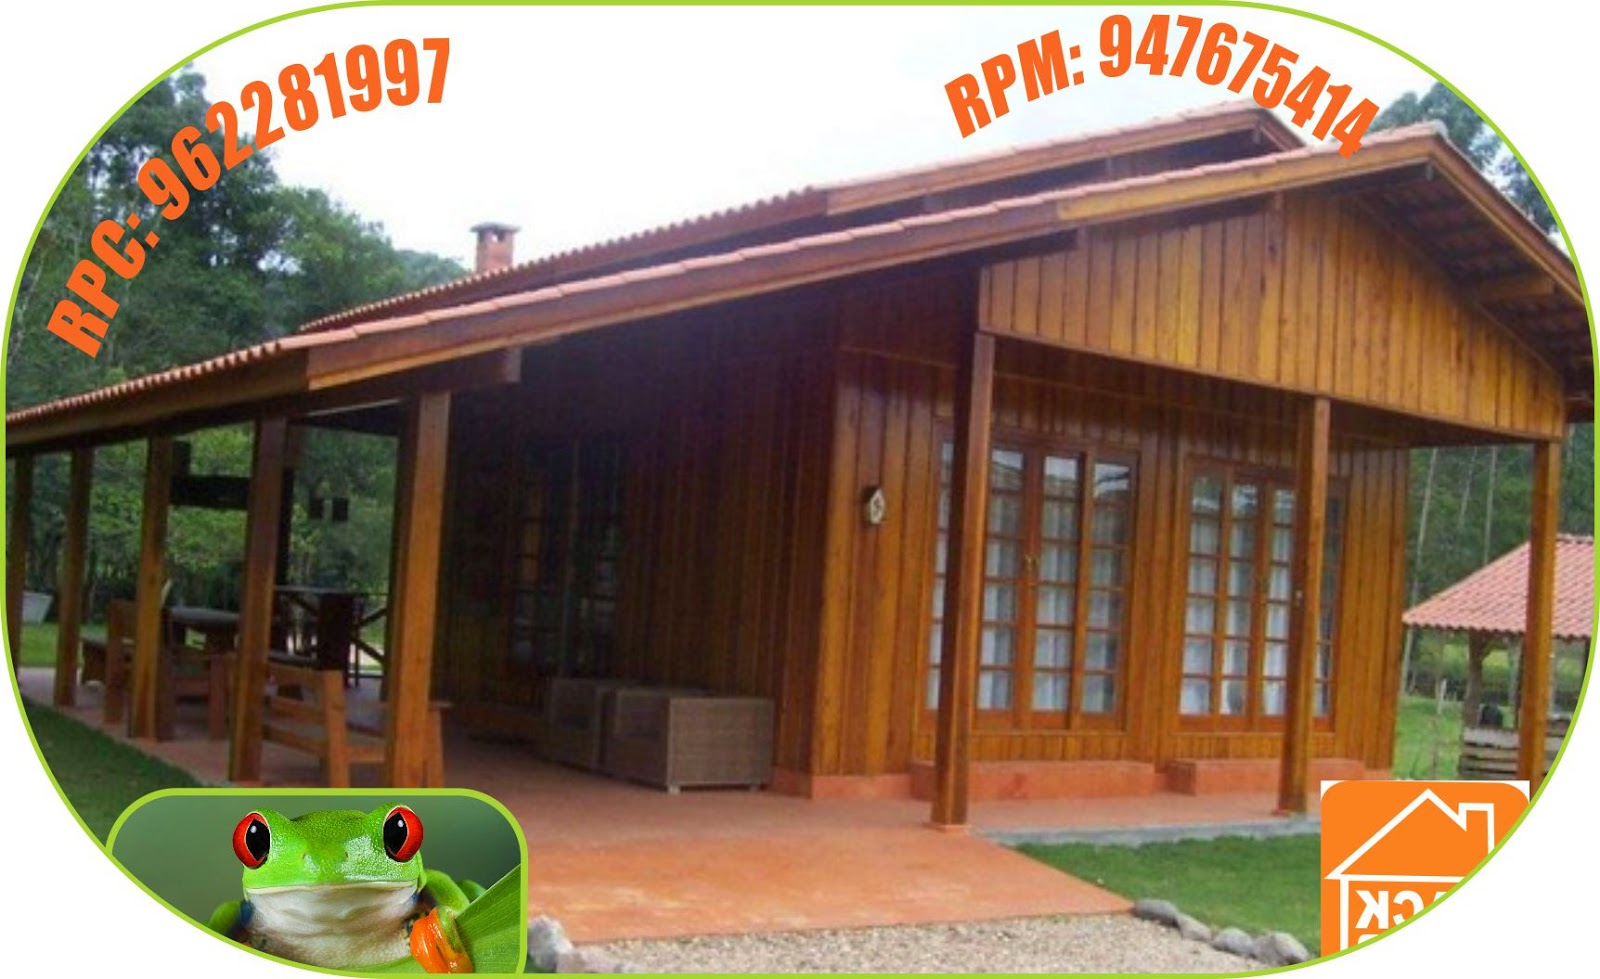 Bungalows caba as de madera para clubes campestres centros for Habitaciones prefabricadas precios